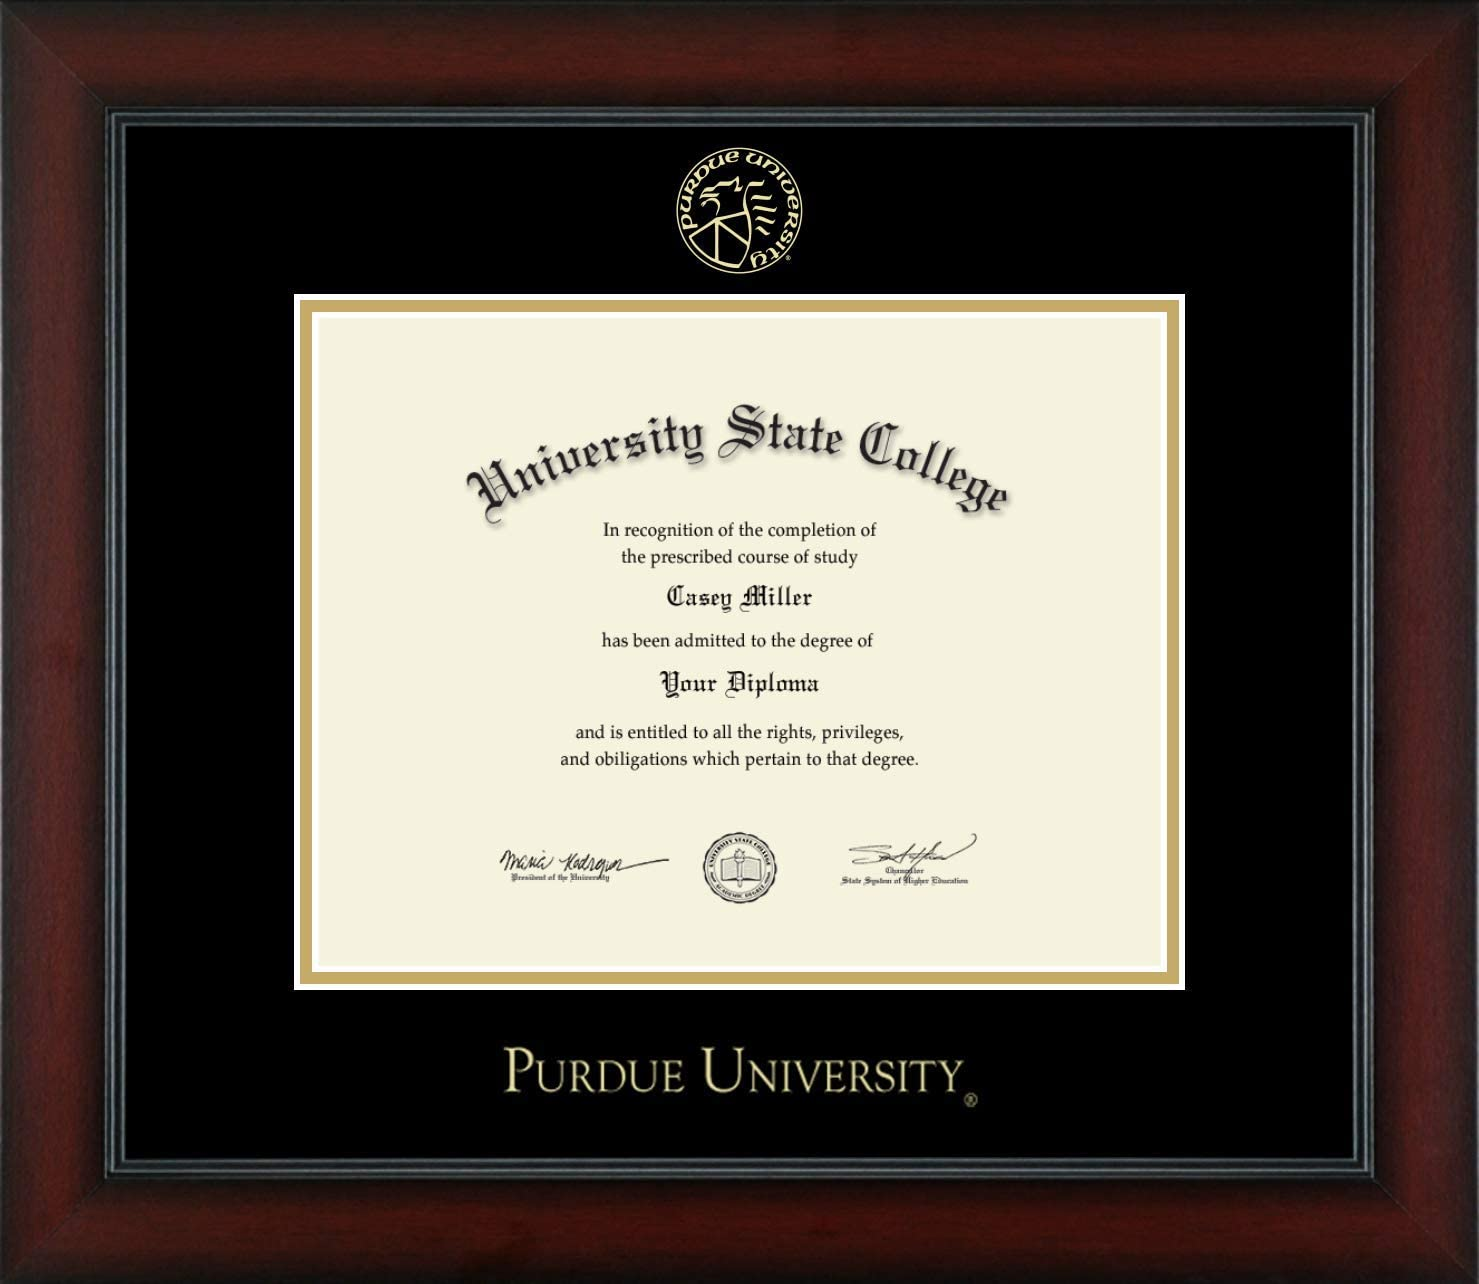 Gold Medallion Tassel Box Laminated Visuals Purdue University Boilermakers Diploma Frame Mahogany